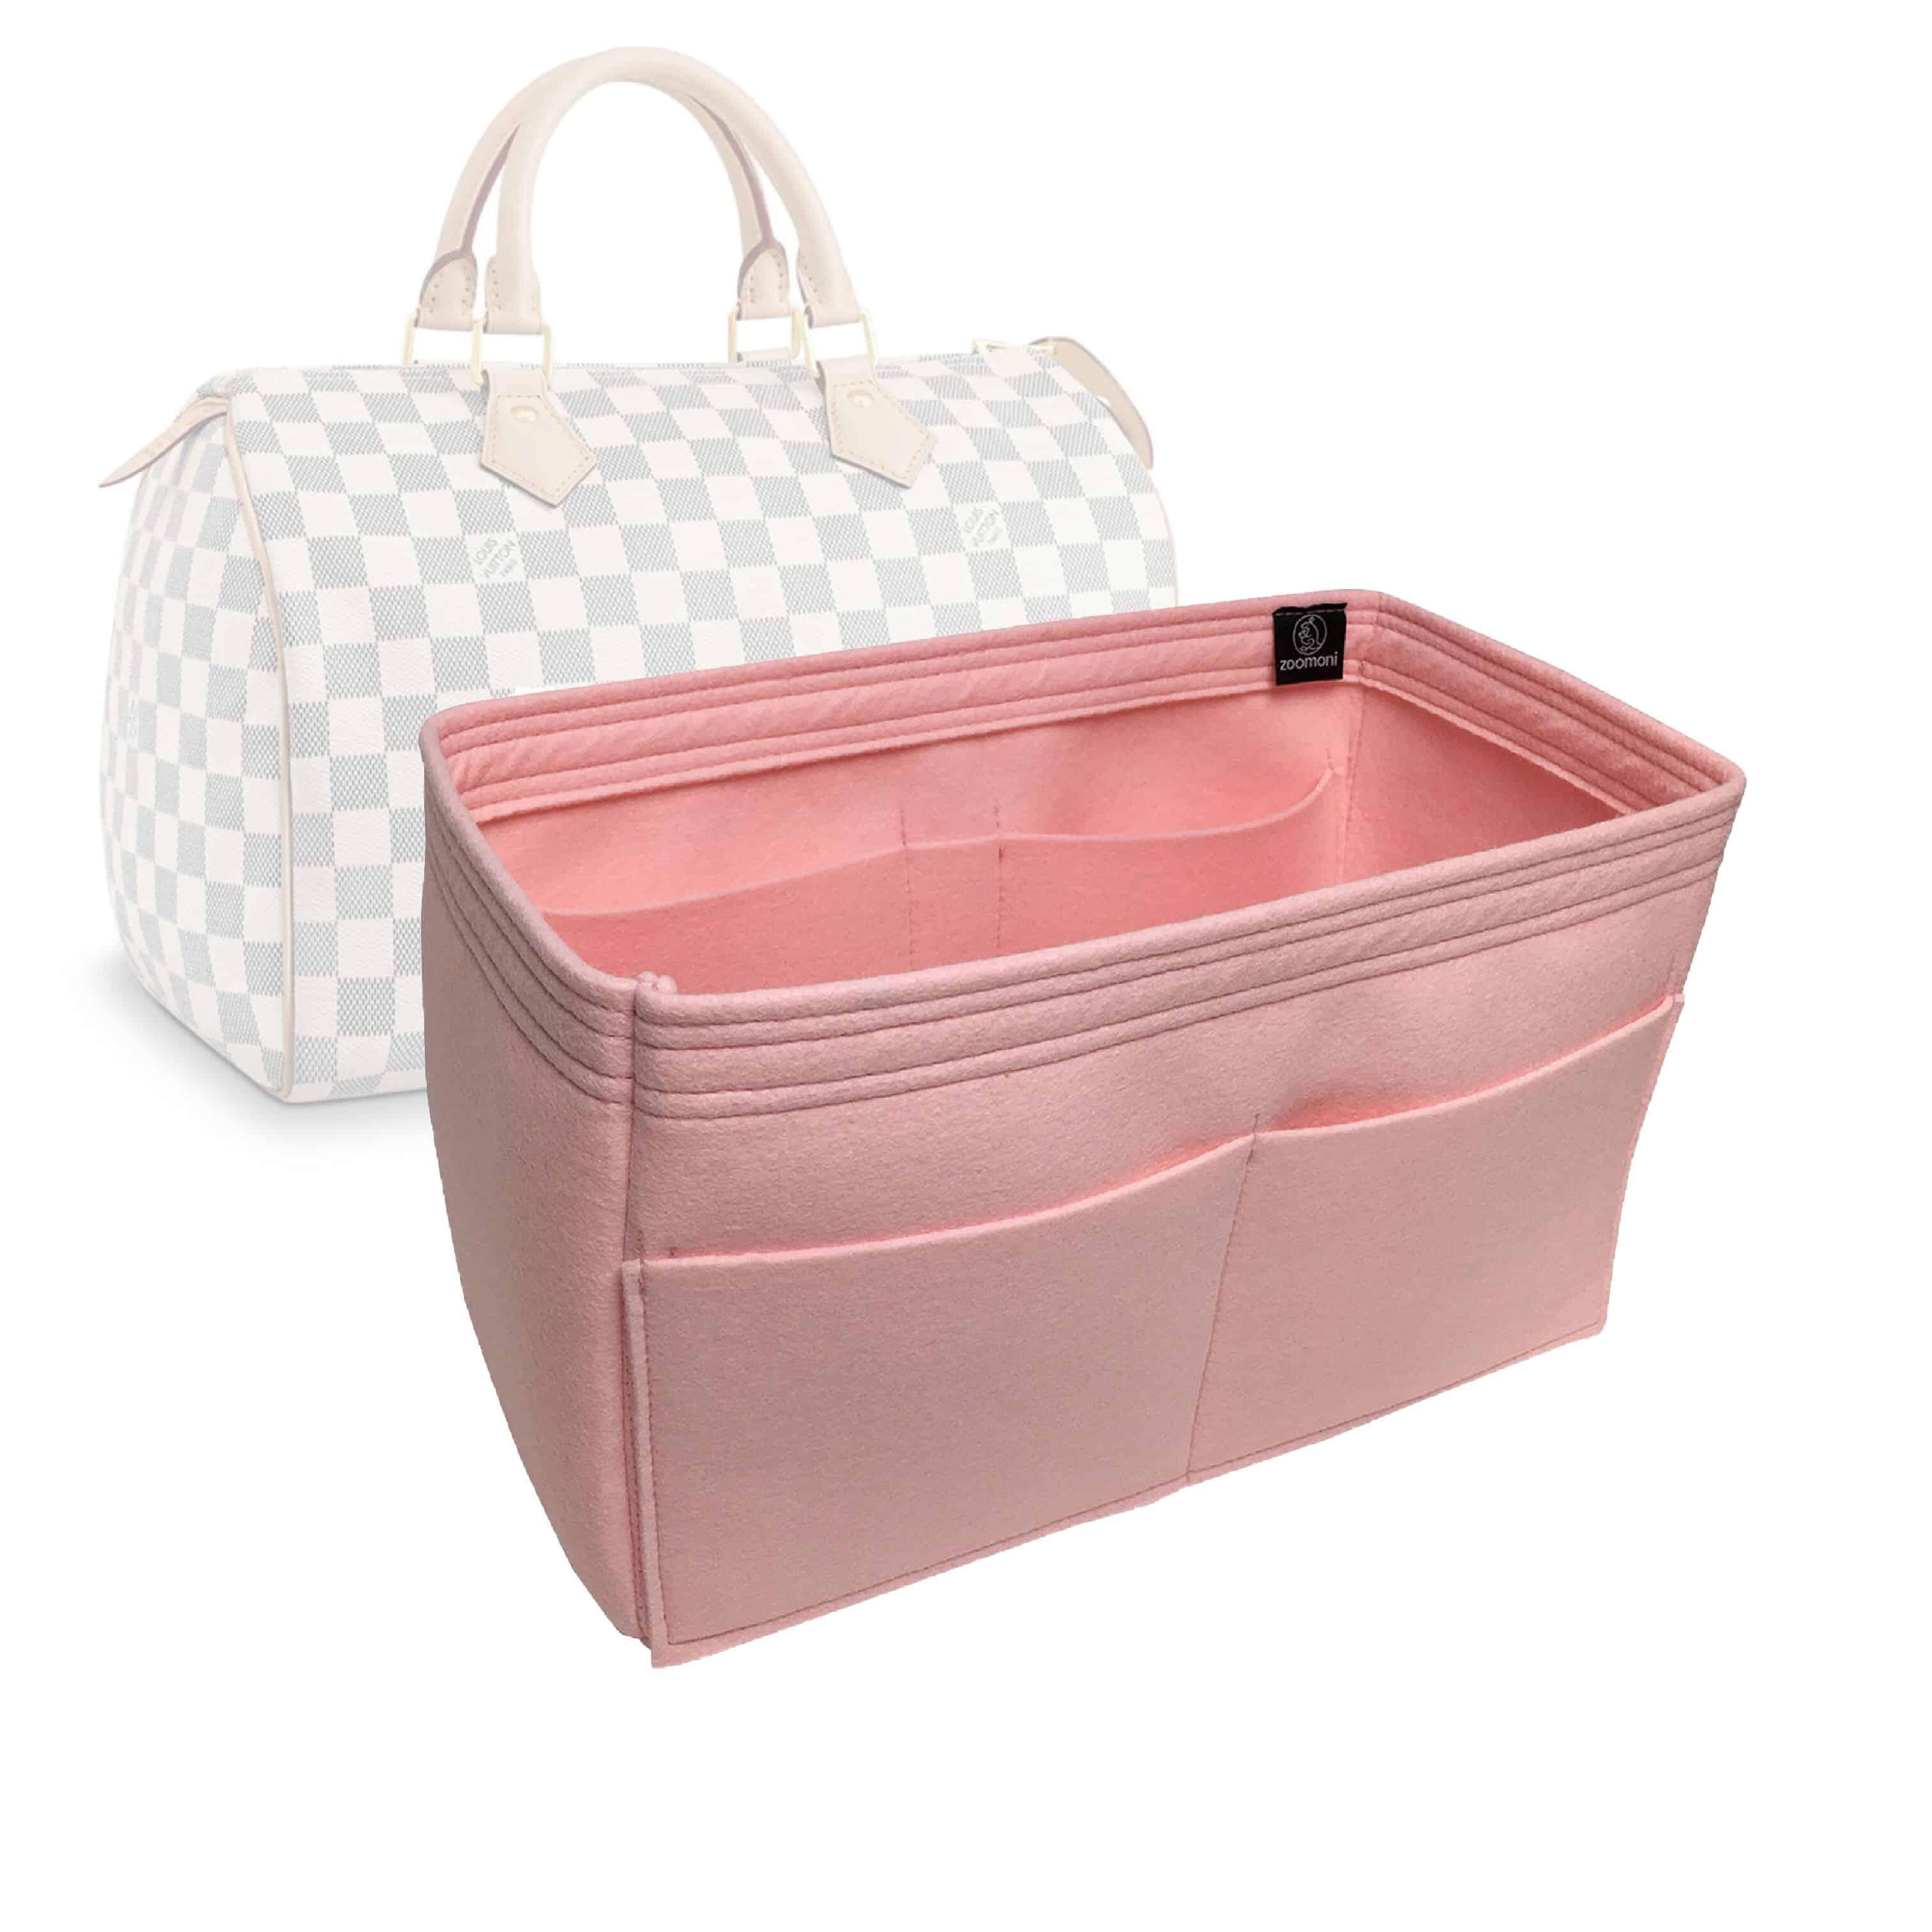 90d26e071c2 Louis Vuitton Speedy 30 (Type 27) Bag Organizer - LV Speedy